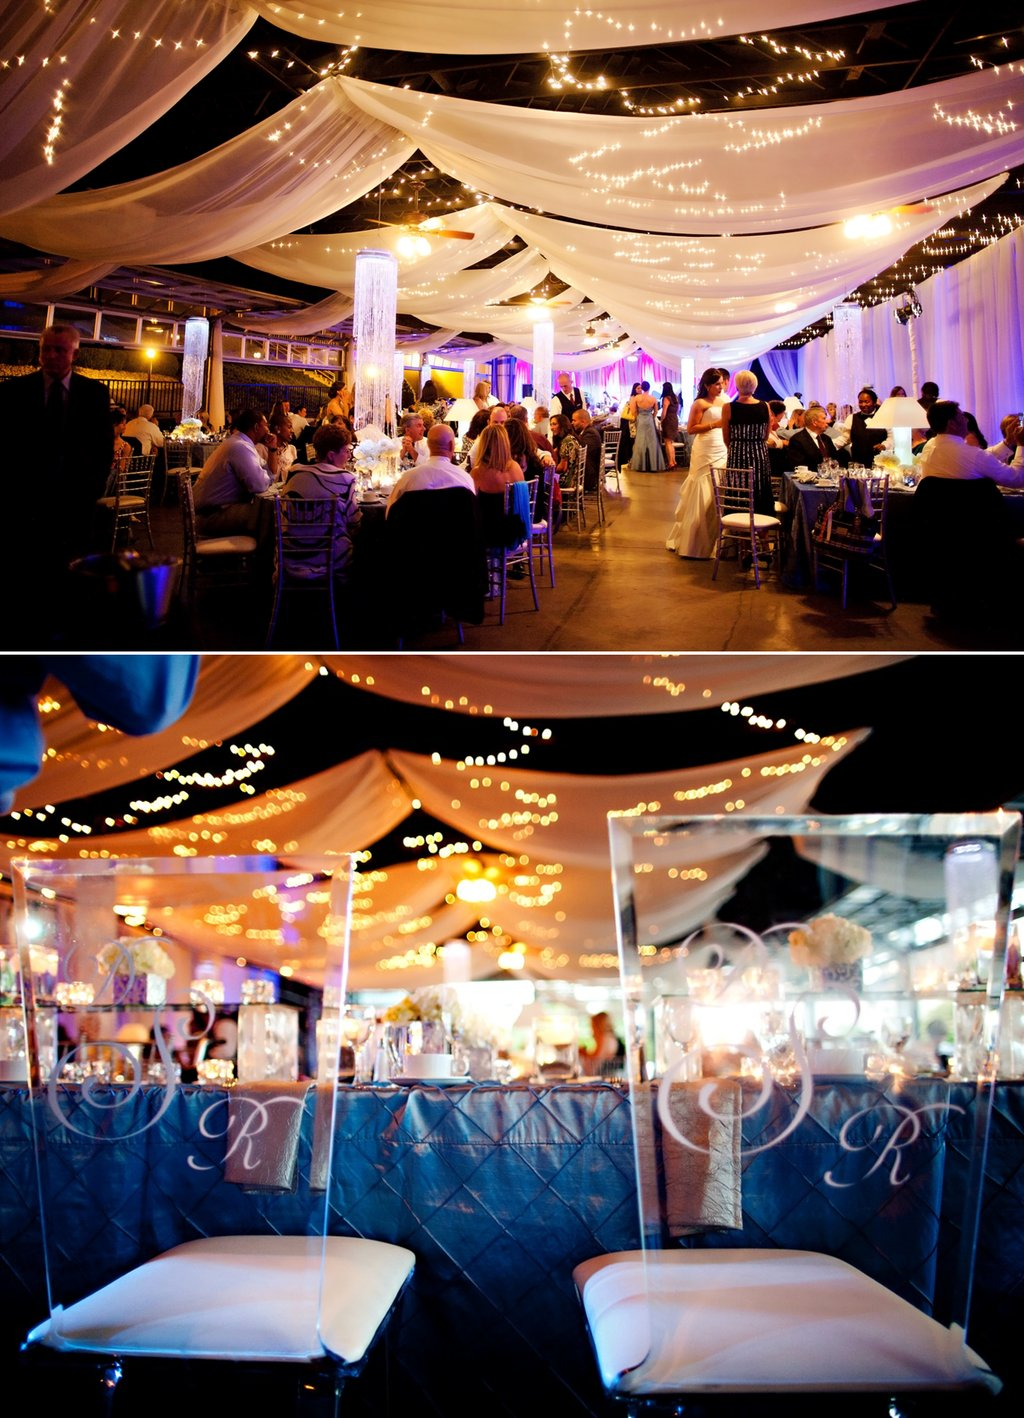 Real-weddings-tent-wedding-venueglamourous-decor.full